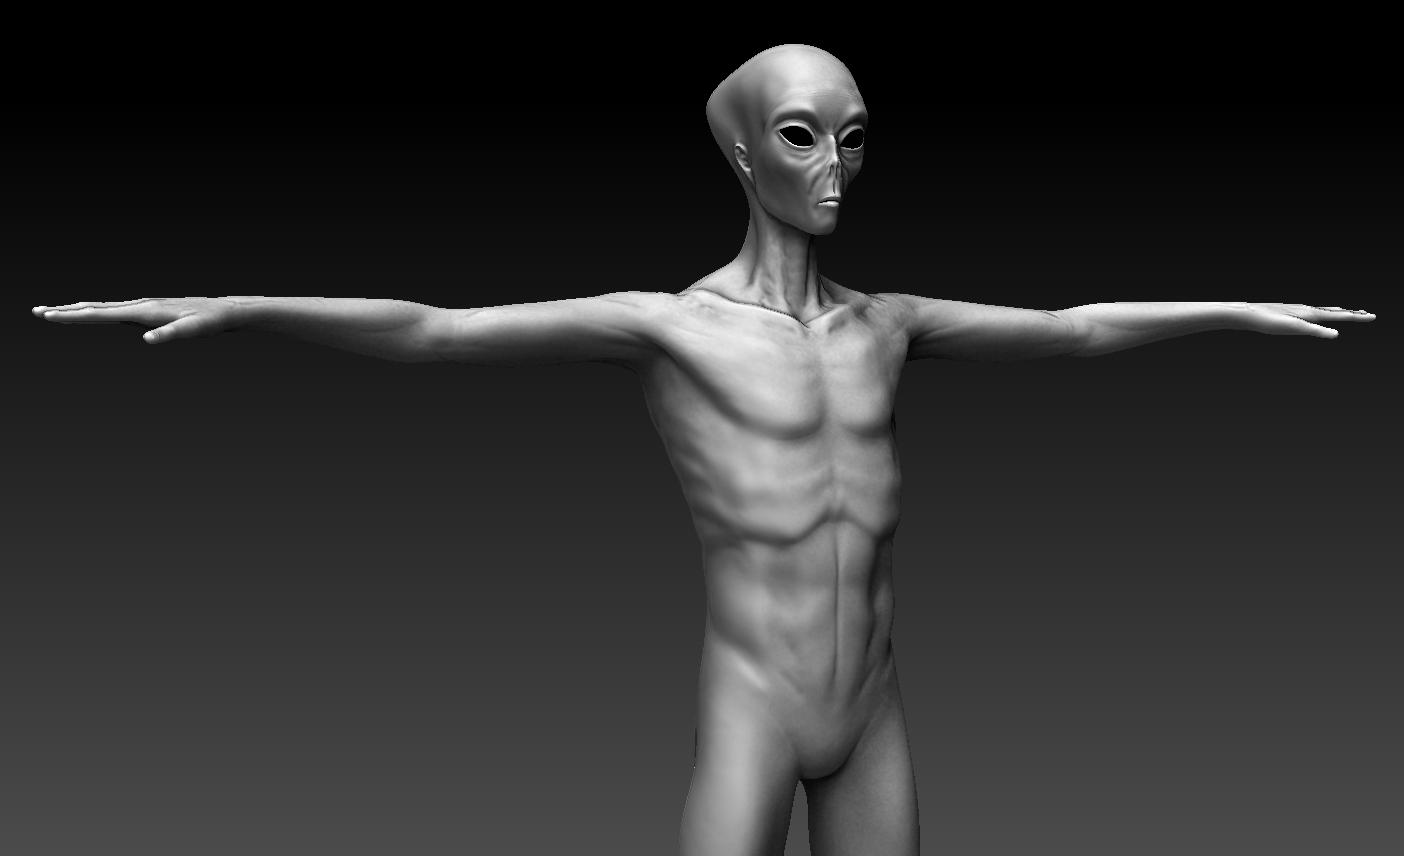 user_img_IL5C4xTk7X_alien_03.jpg